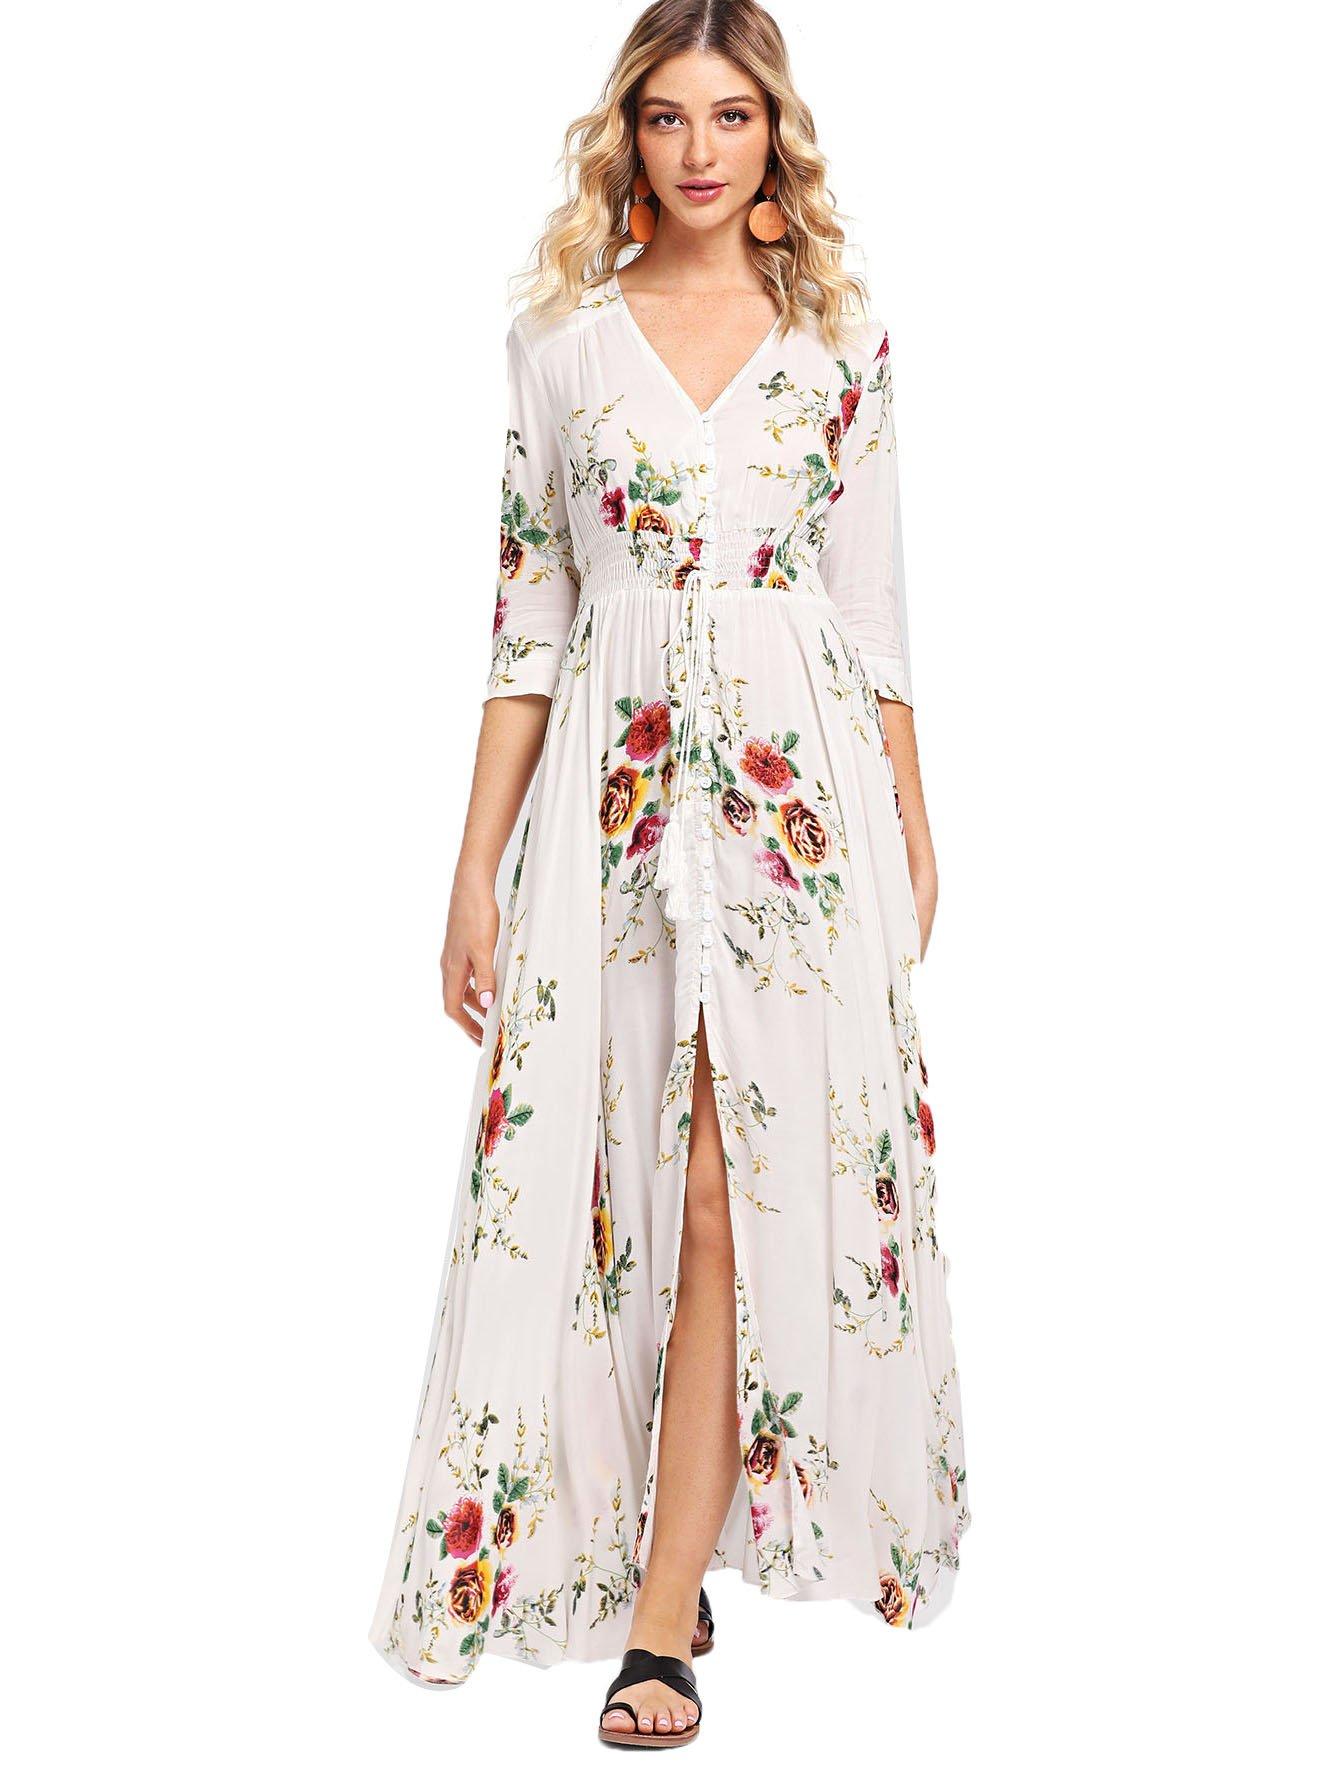 Milumia Women's Button up Split Floral Print Flowy Party Maxi Dress Small White-1